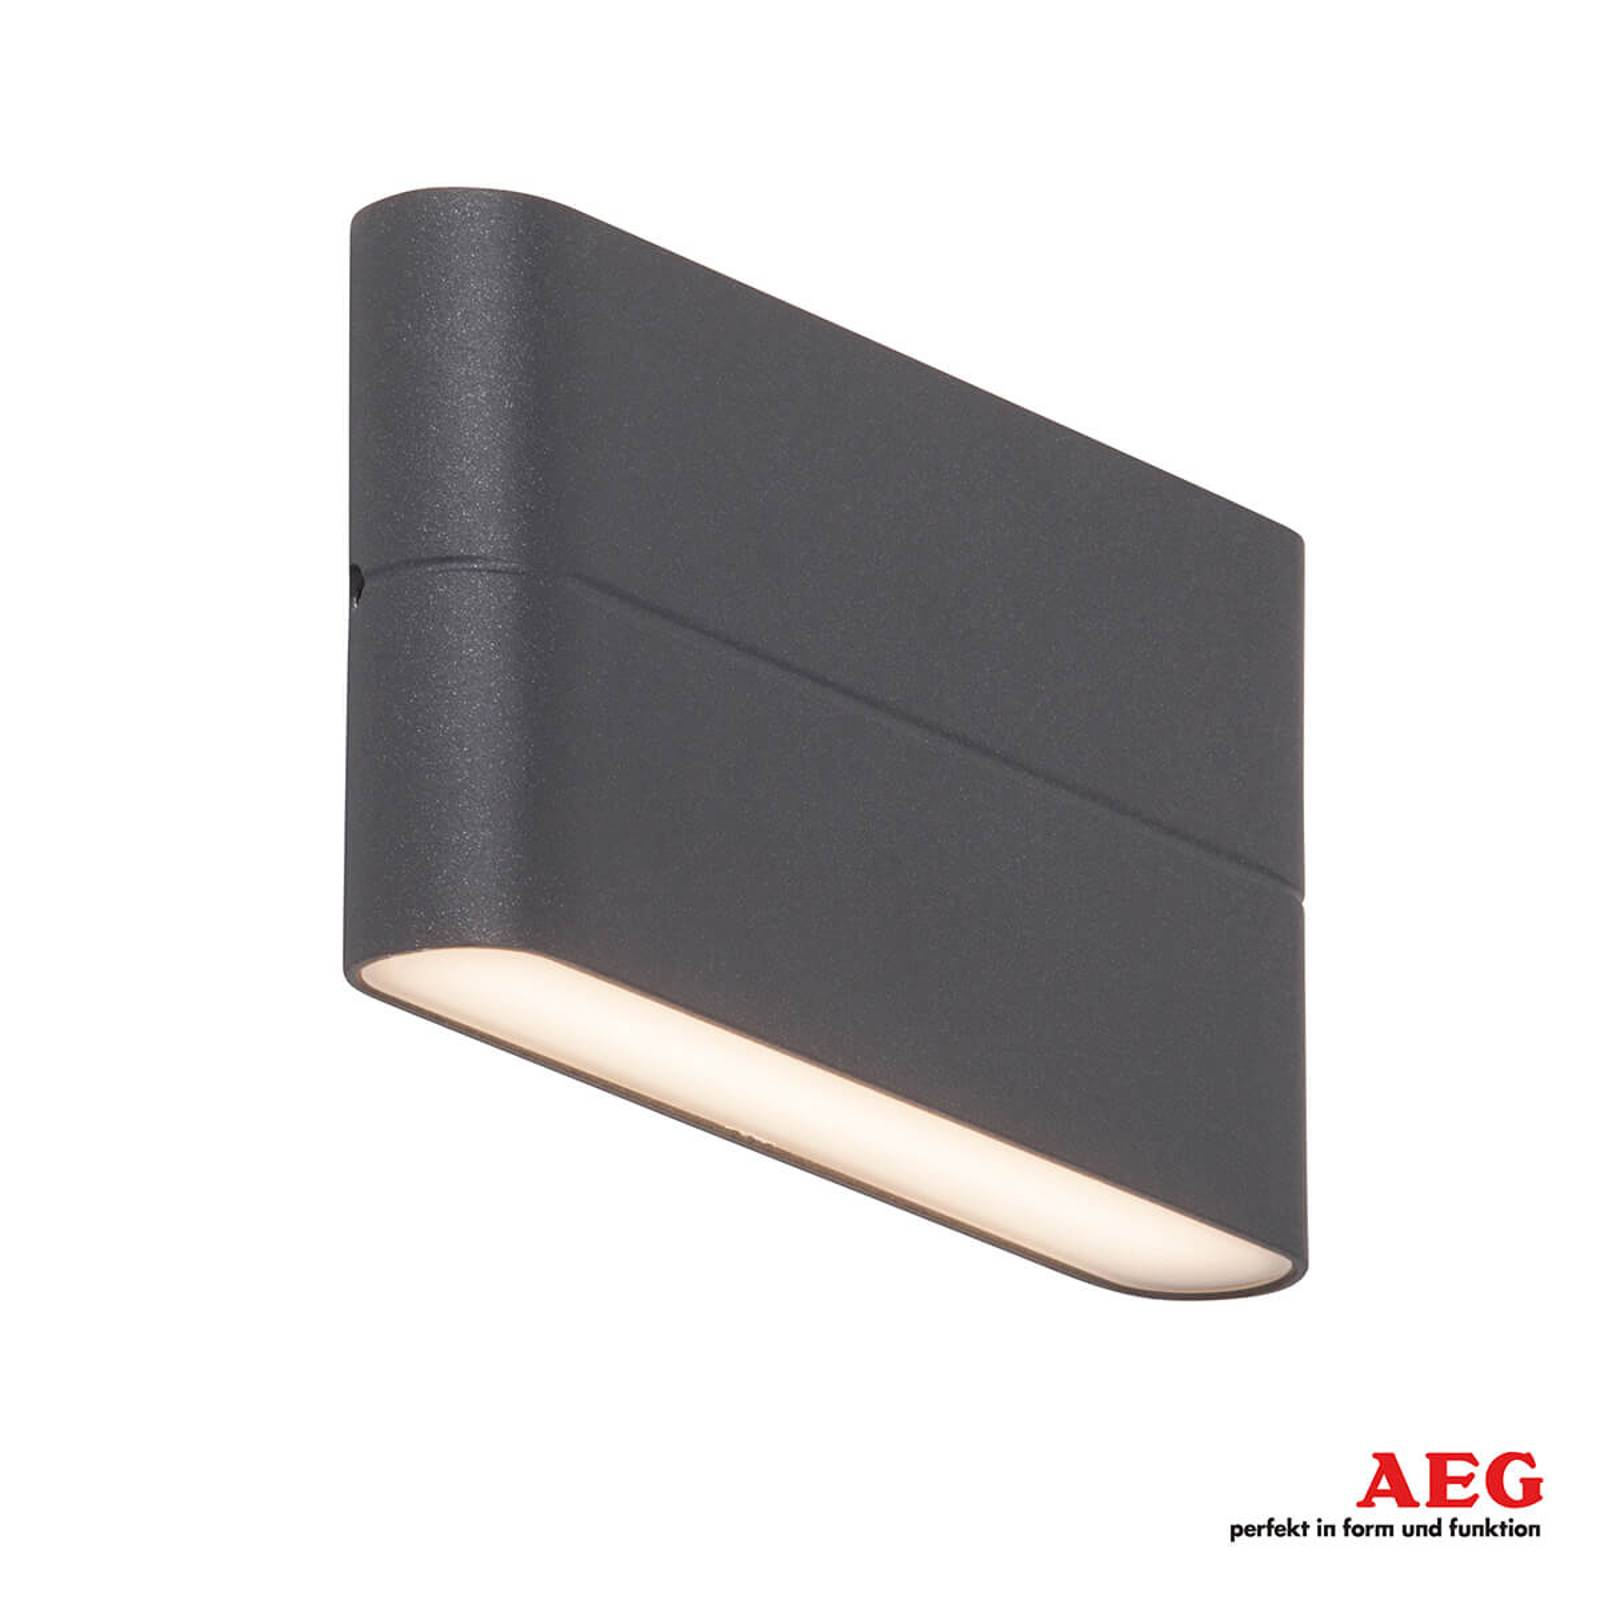 AEG Telesto - LED-Außenwandleuchte up and down